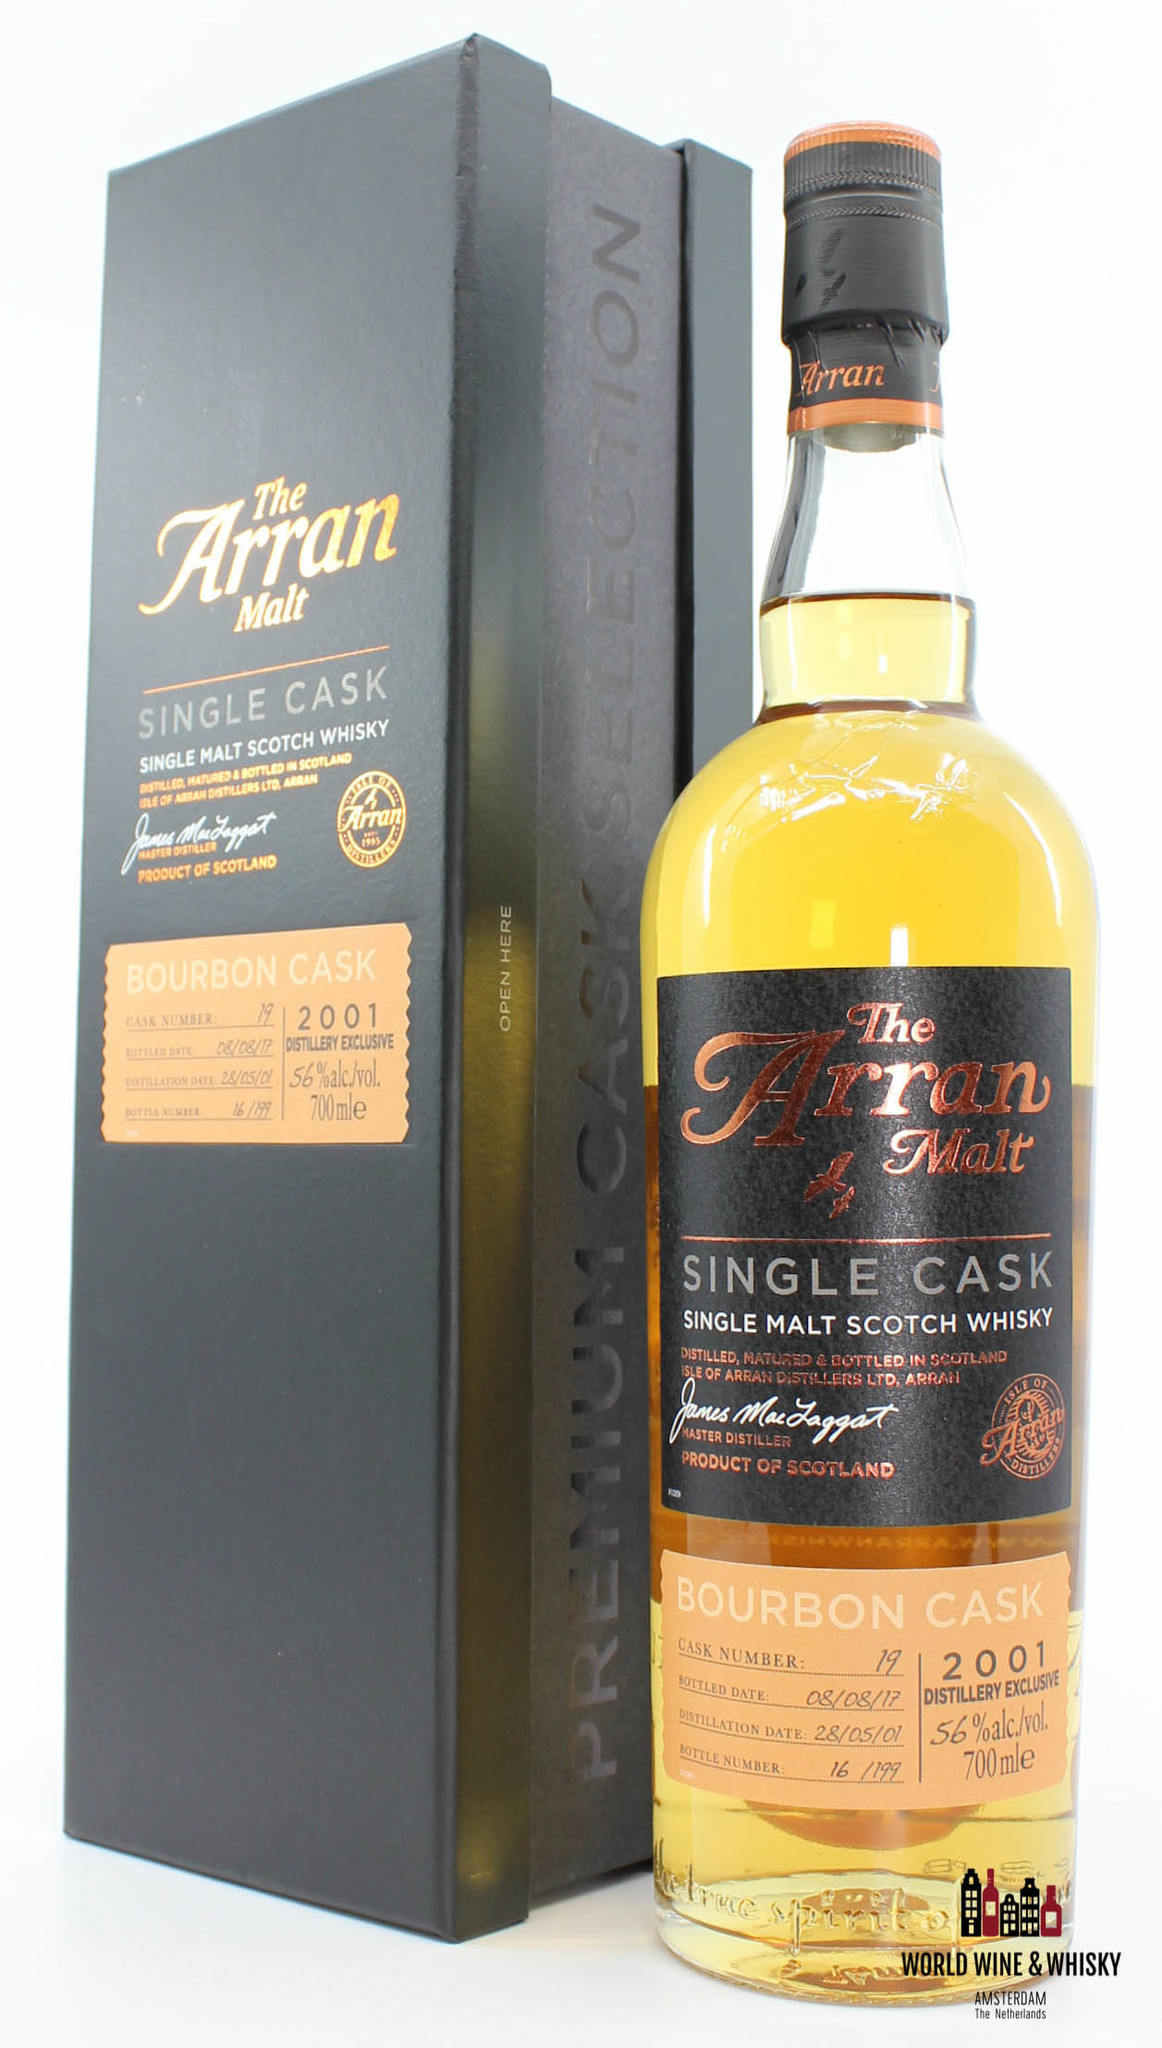 Arran Arran 16 Years Old 2001 2017 Cask 19 Bourbon Cask - Distillery Exclusive 56%